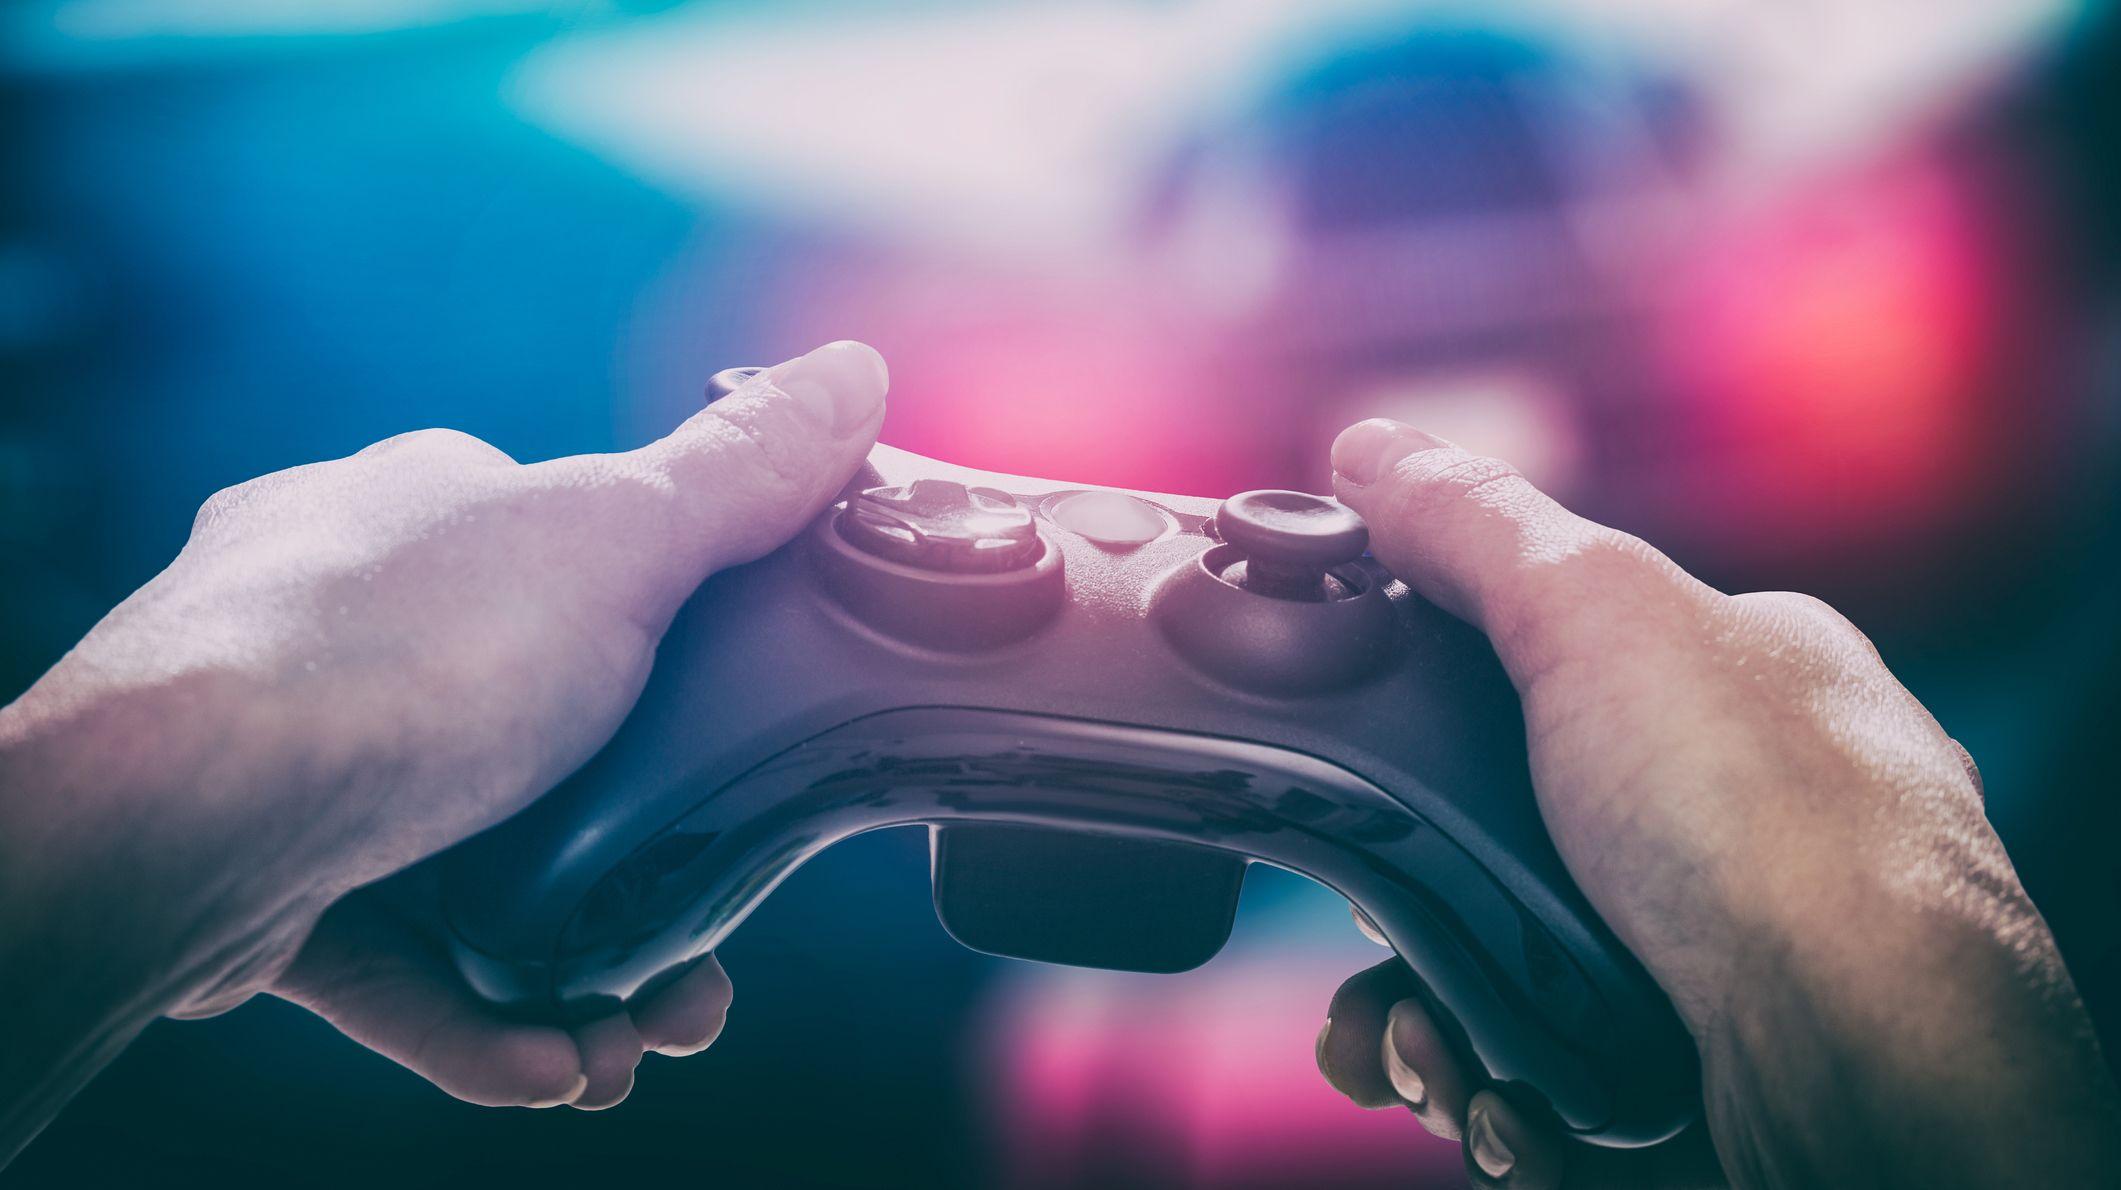 How Violent Video Games, Racial Bias and School Shootings